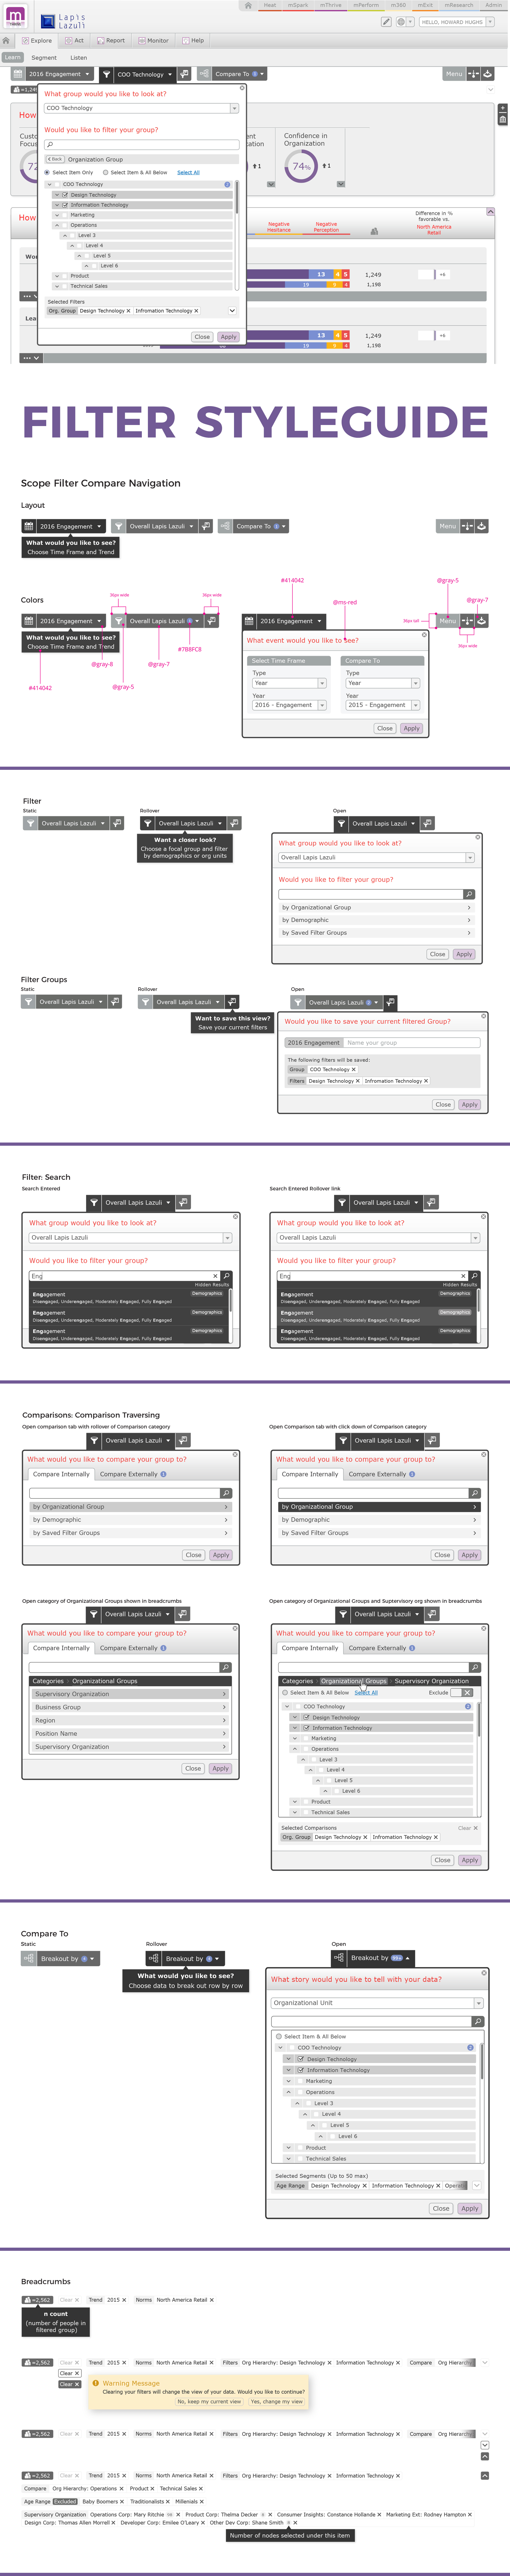 Analytic Dashboard Filter UX/UI Design Stylequide